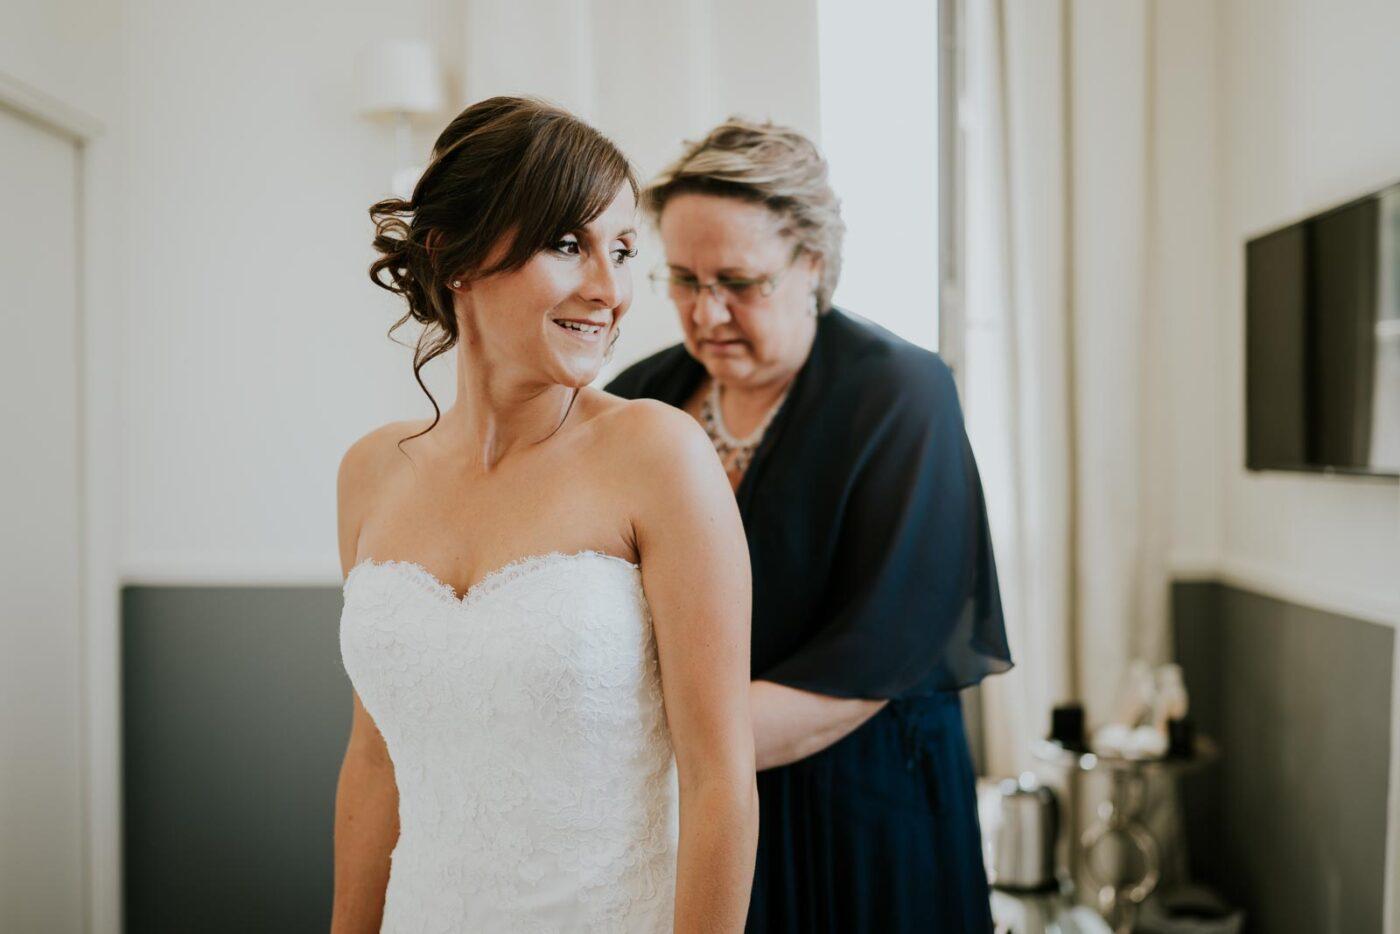 Fermeture de la robe de mariée, la tension monte !